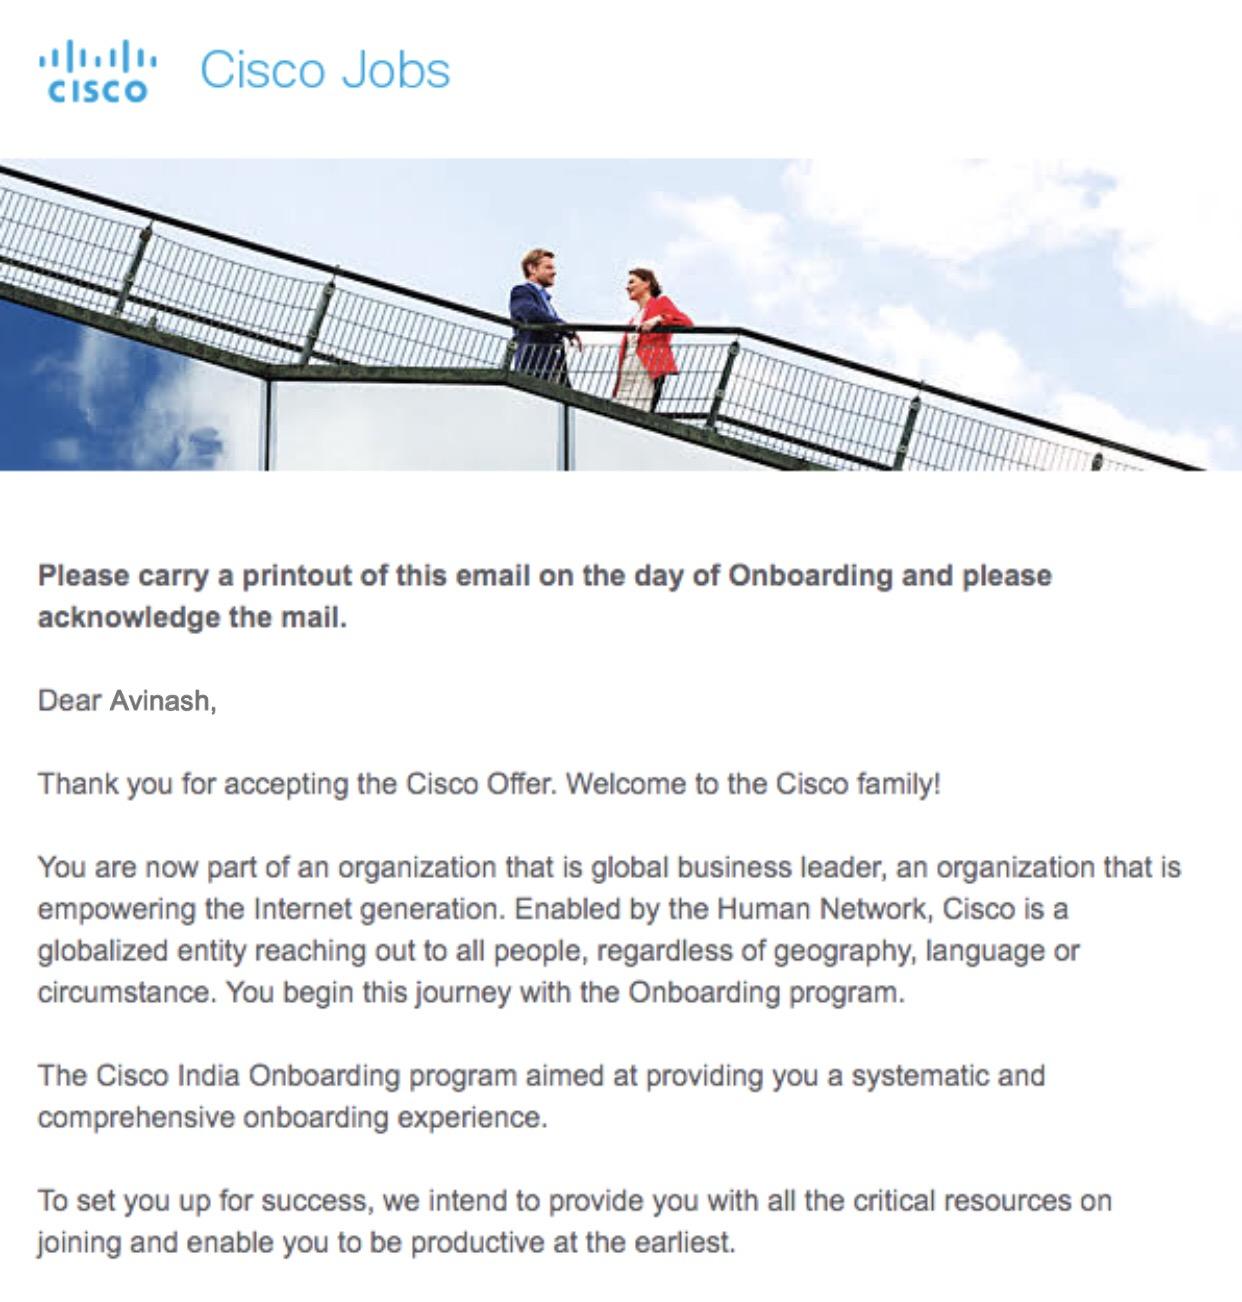 Avinash Placed in Cisco